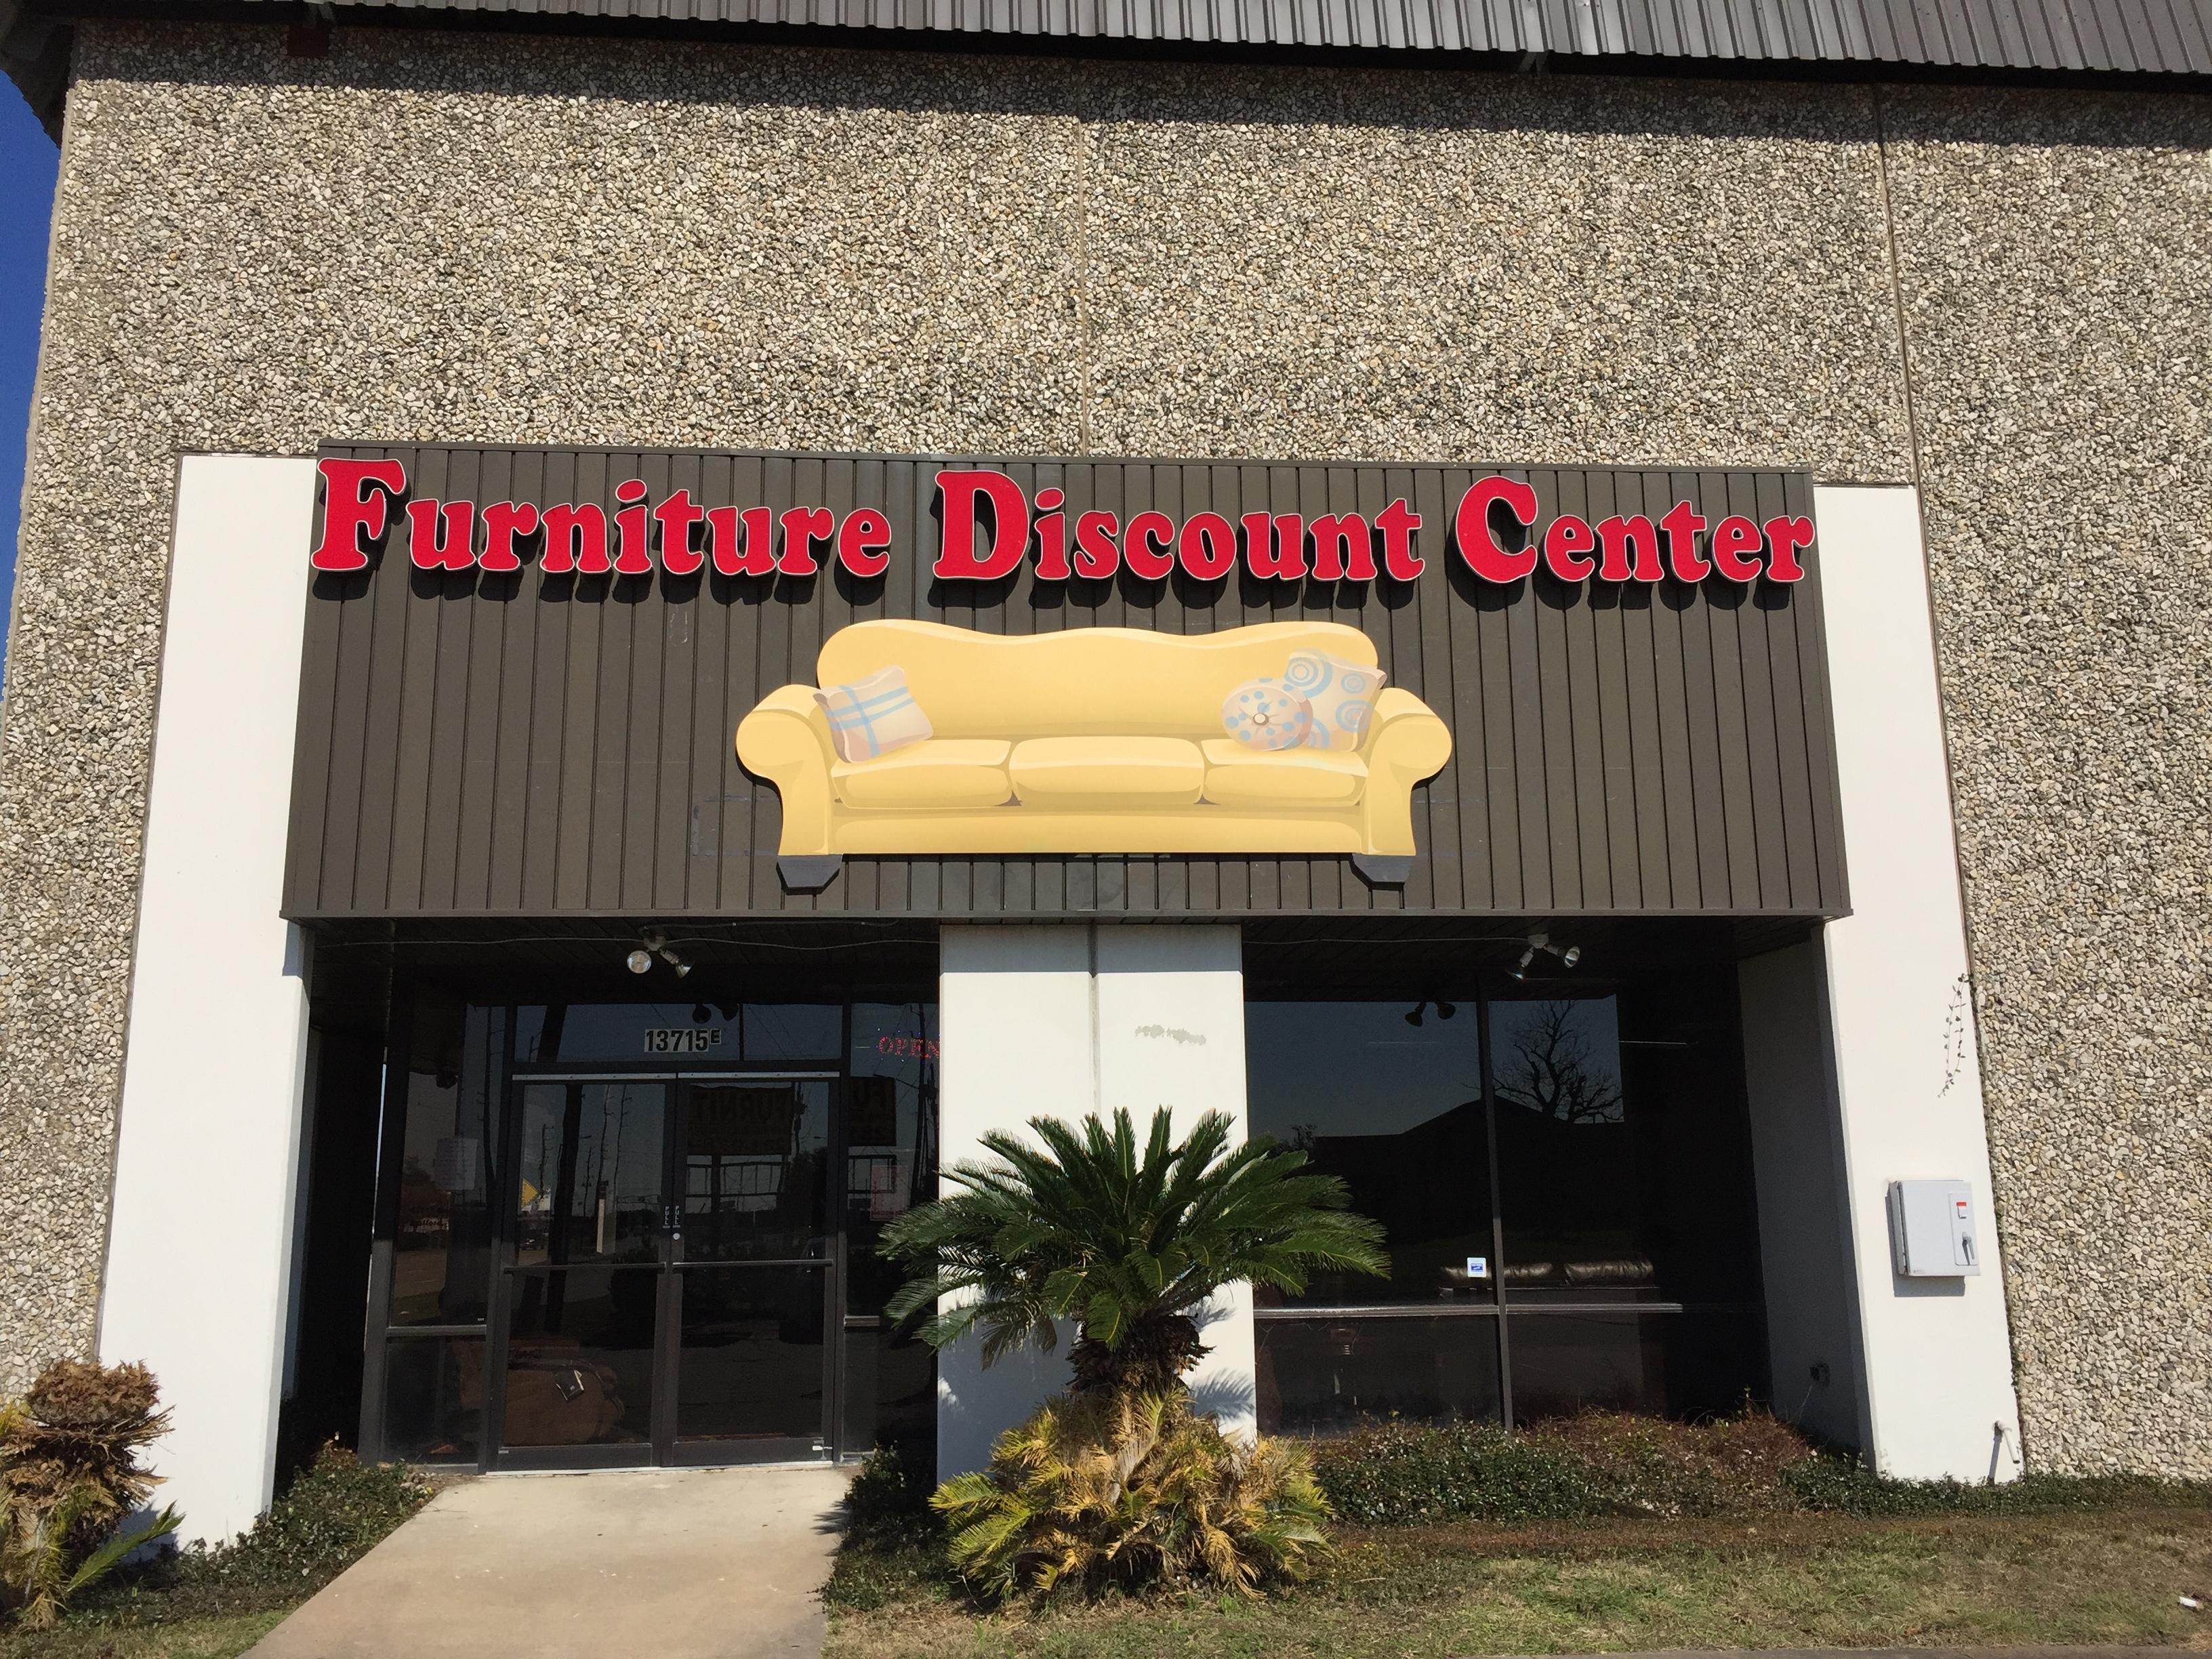 FURNITURE DISCOUNT CENTER 13715 Murphy Rd. Ste E, Stafford, TX 77477    YP.com